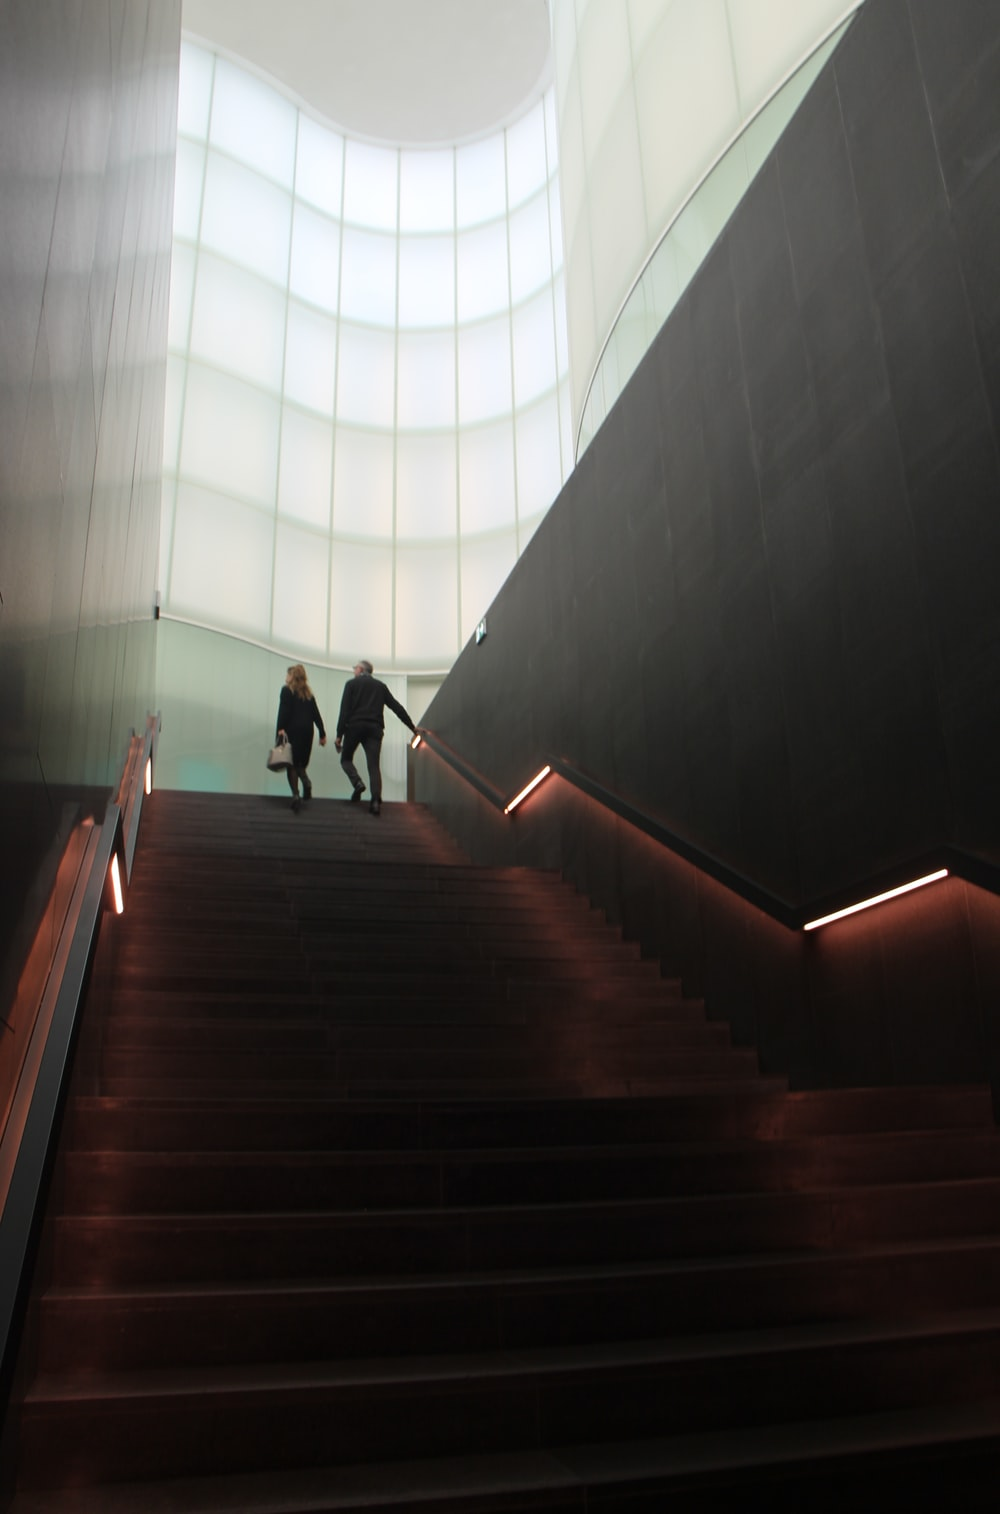 2 people walking on brown staircase